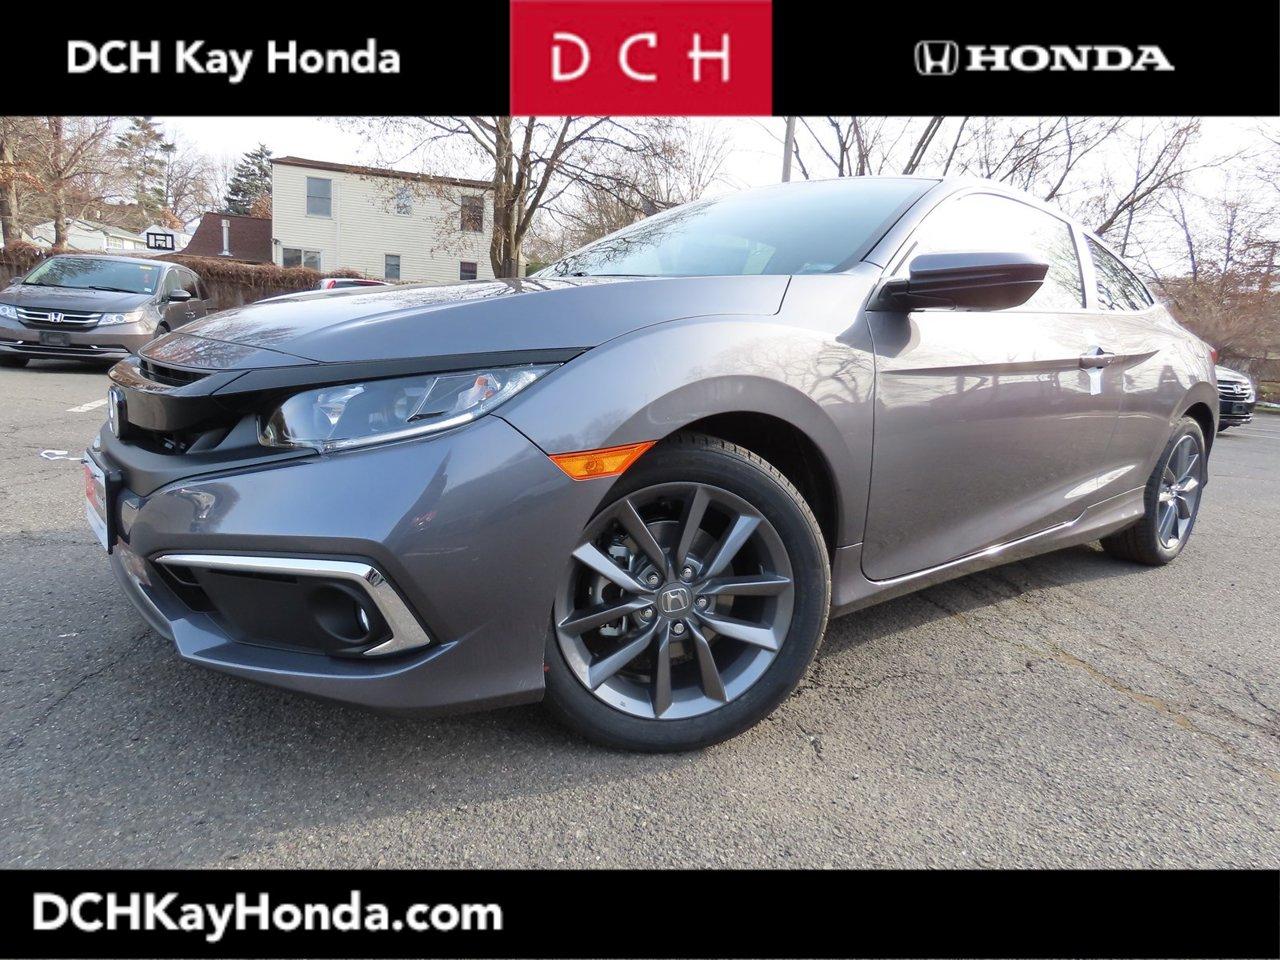 New 2019 Honda Civic Coupe in Eatontown, NJ